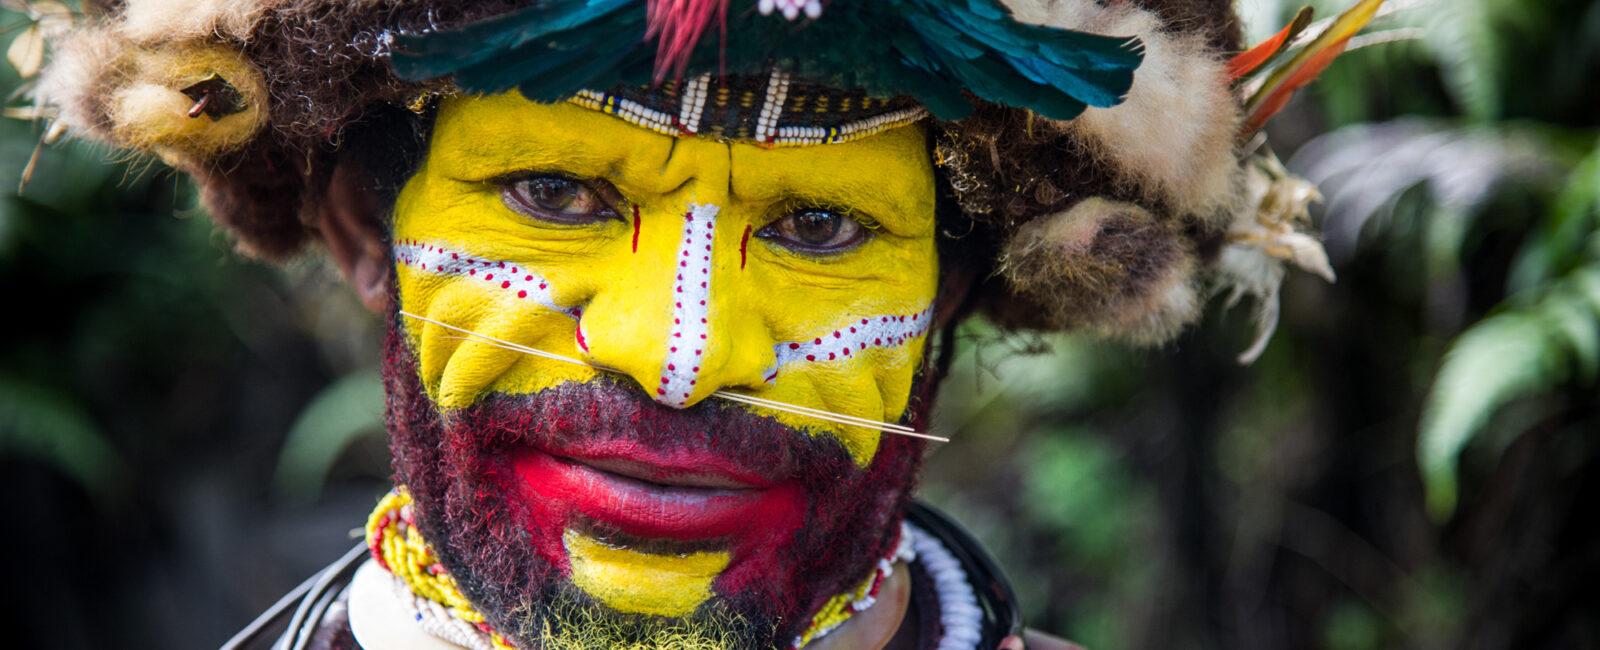 Huli Tribesman